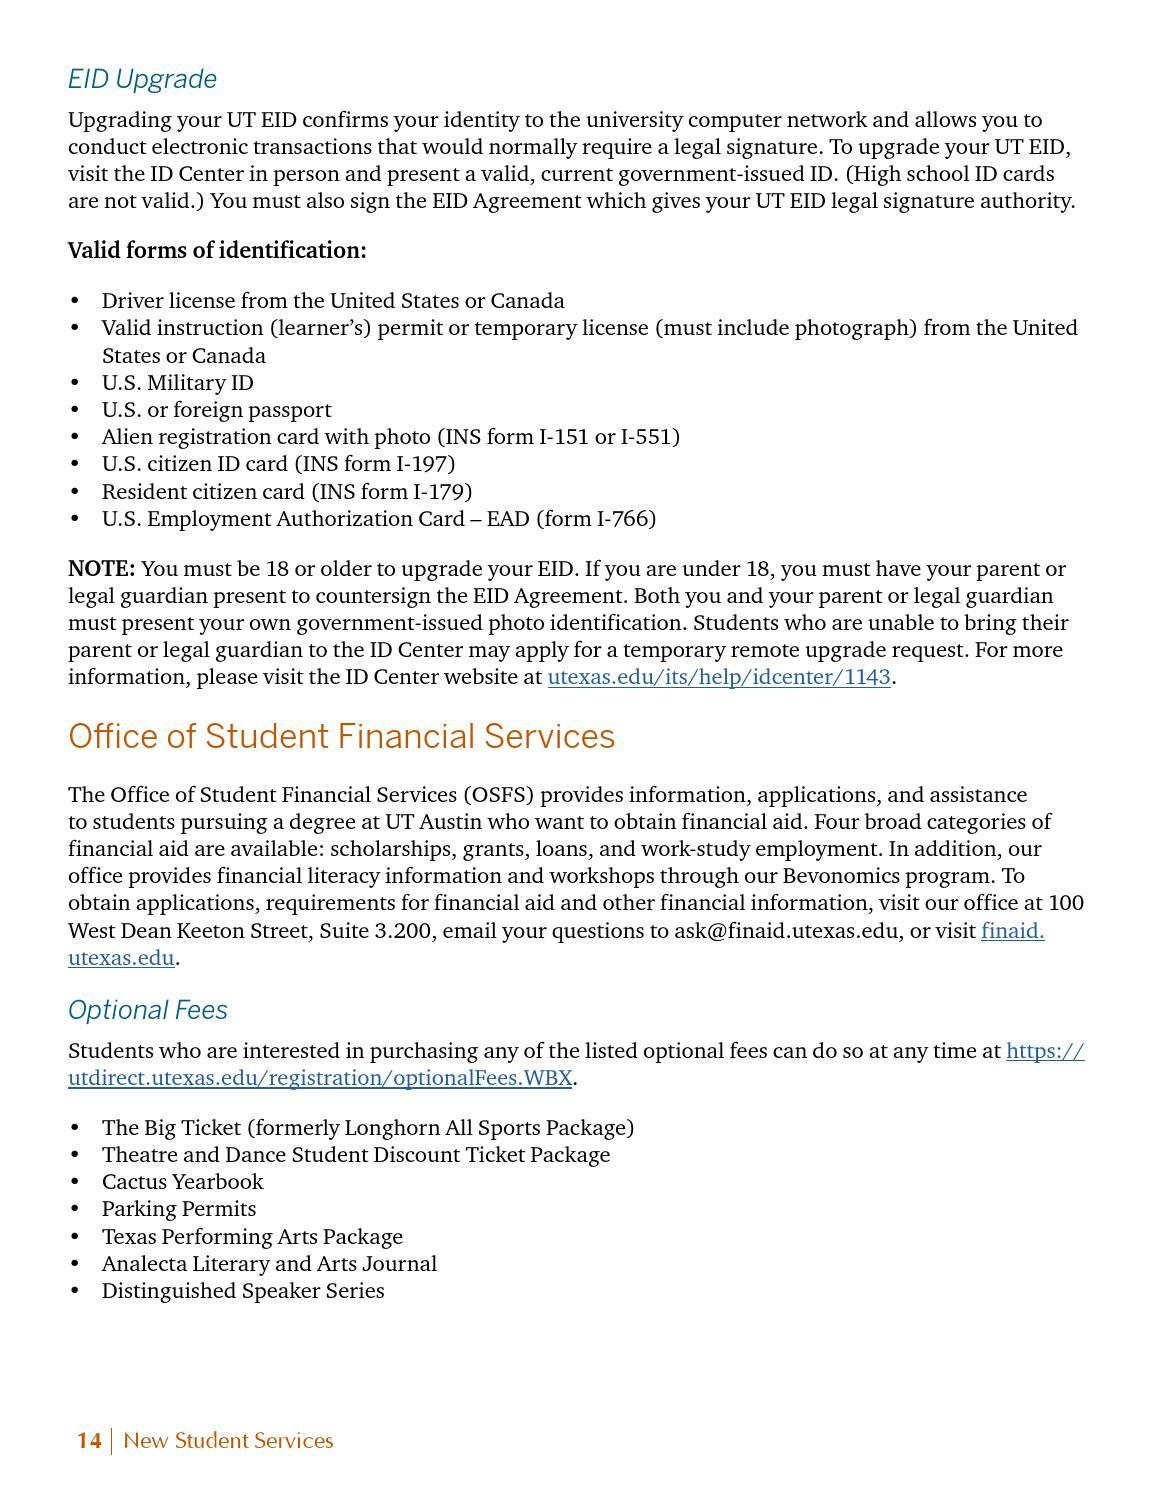 Ut Austin Spring 2015 New Student Guide By Ut Orientation Issuu